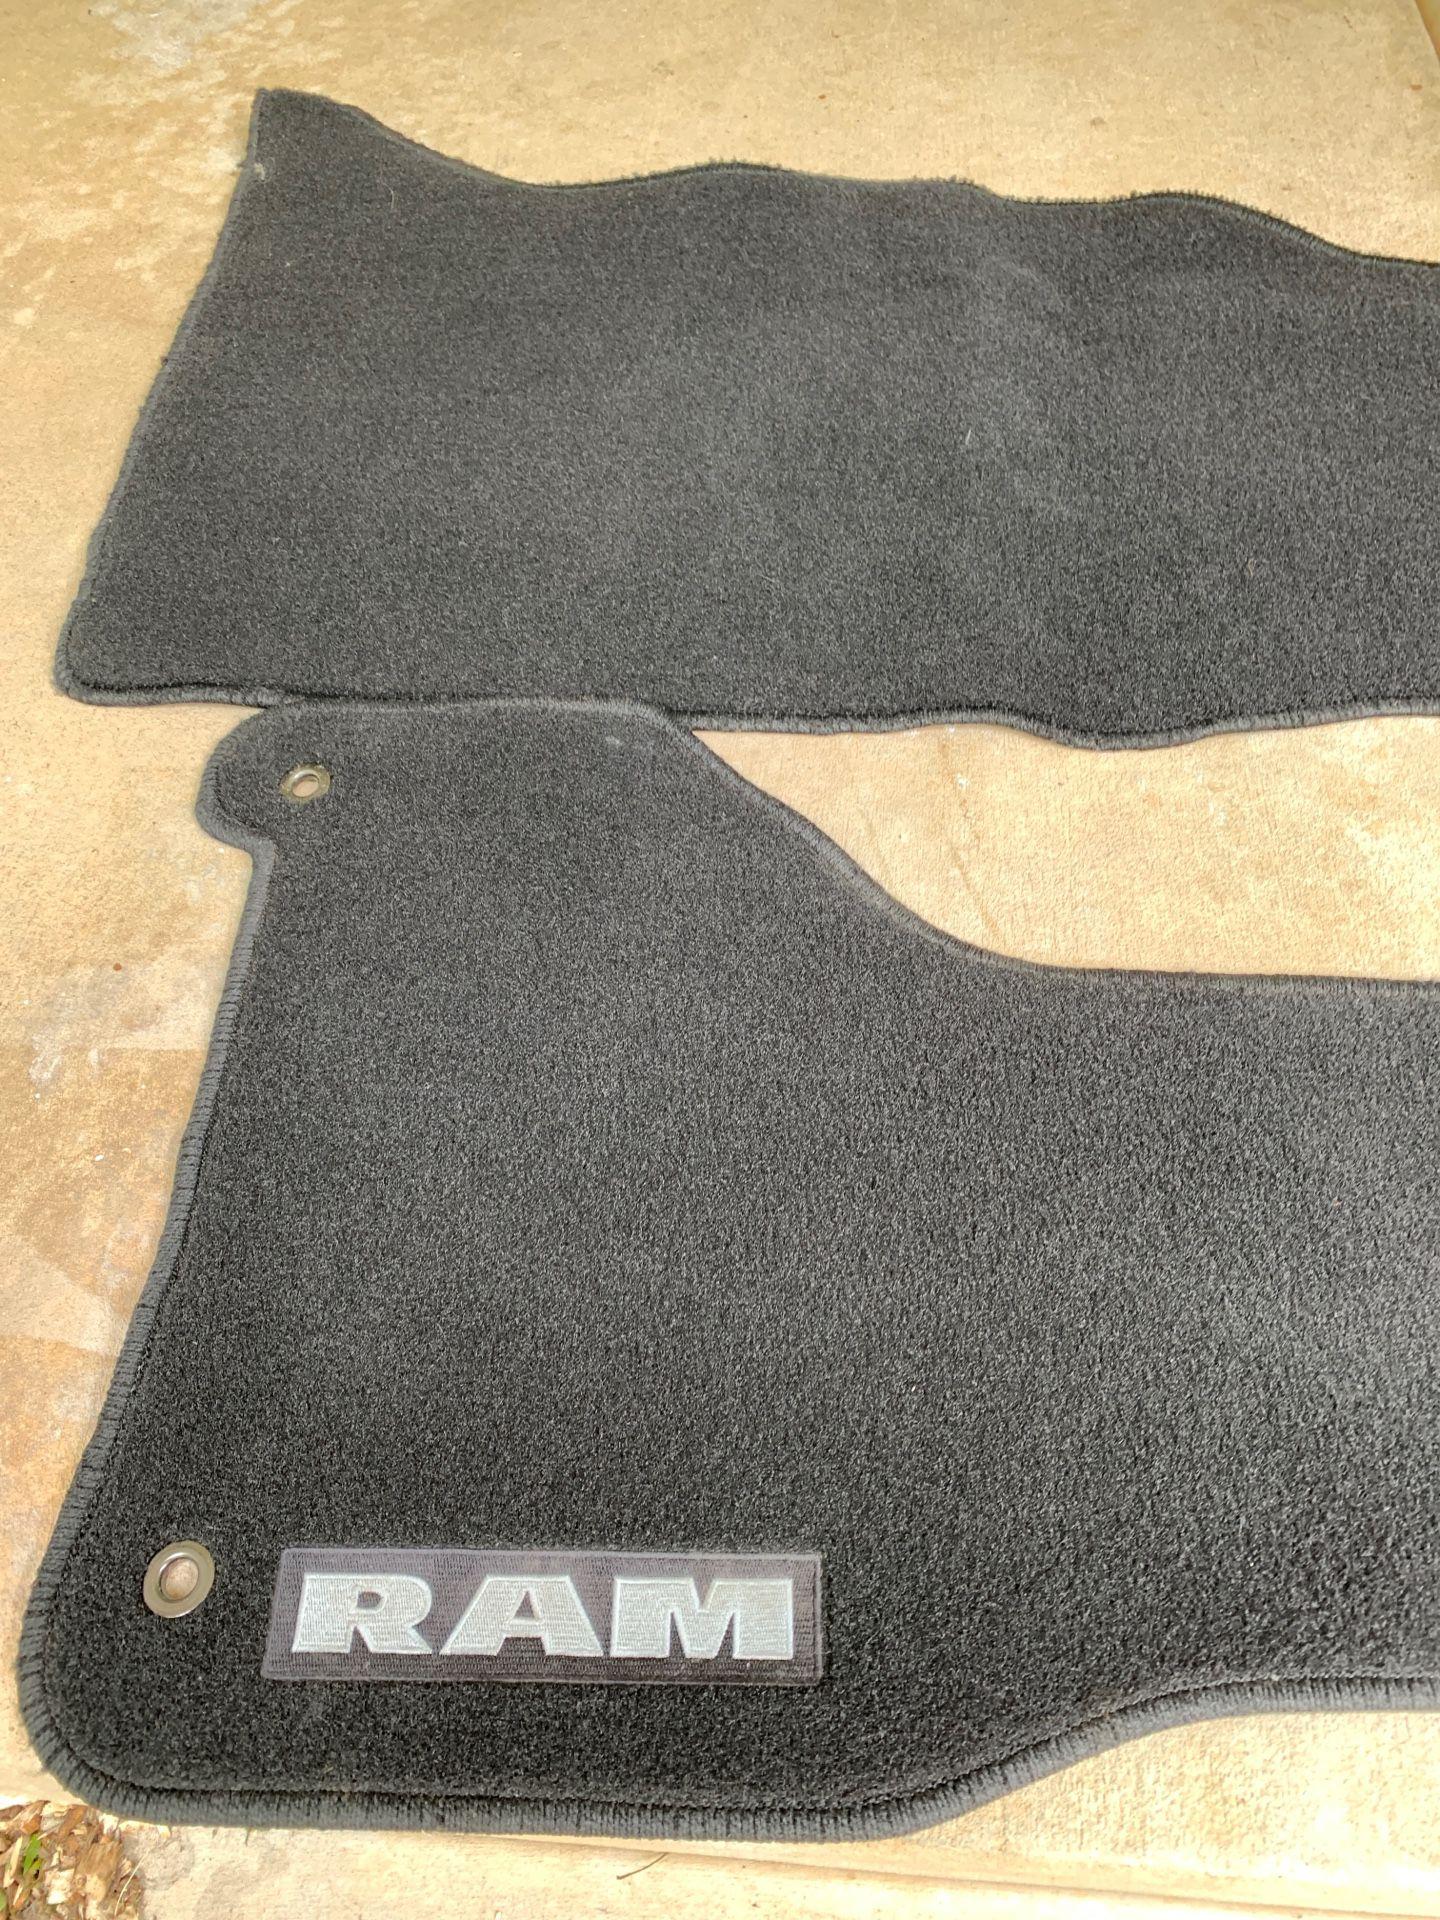 Brand new RAM 1500 floor mats